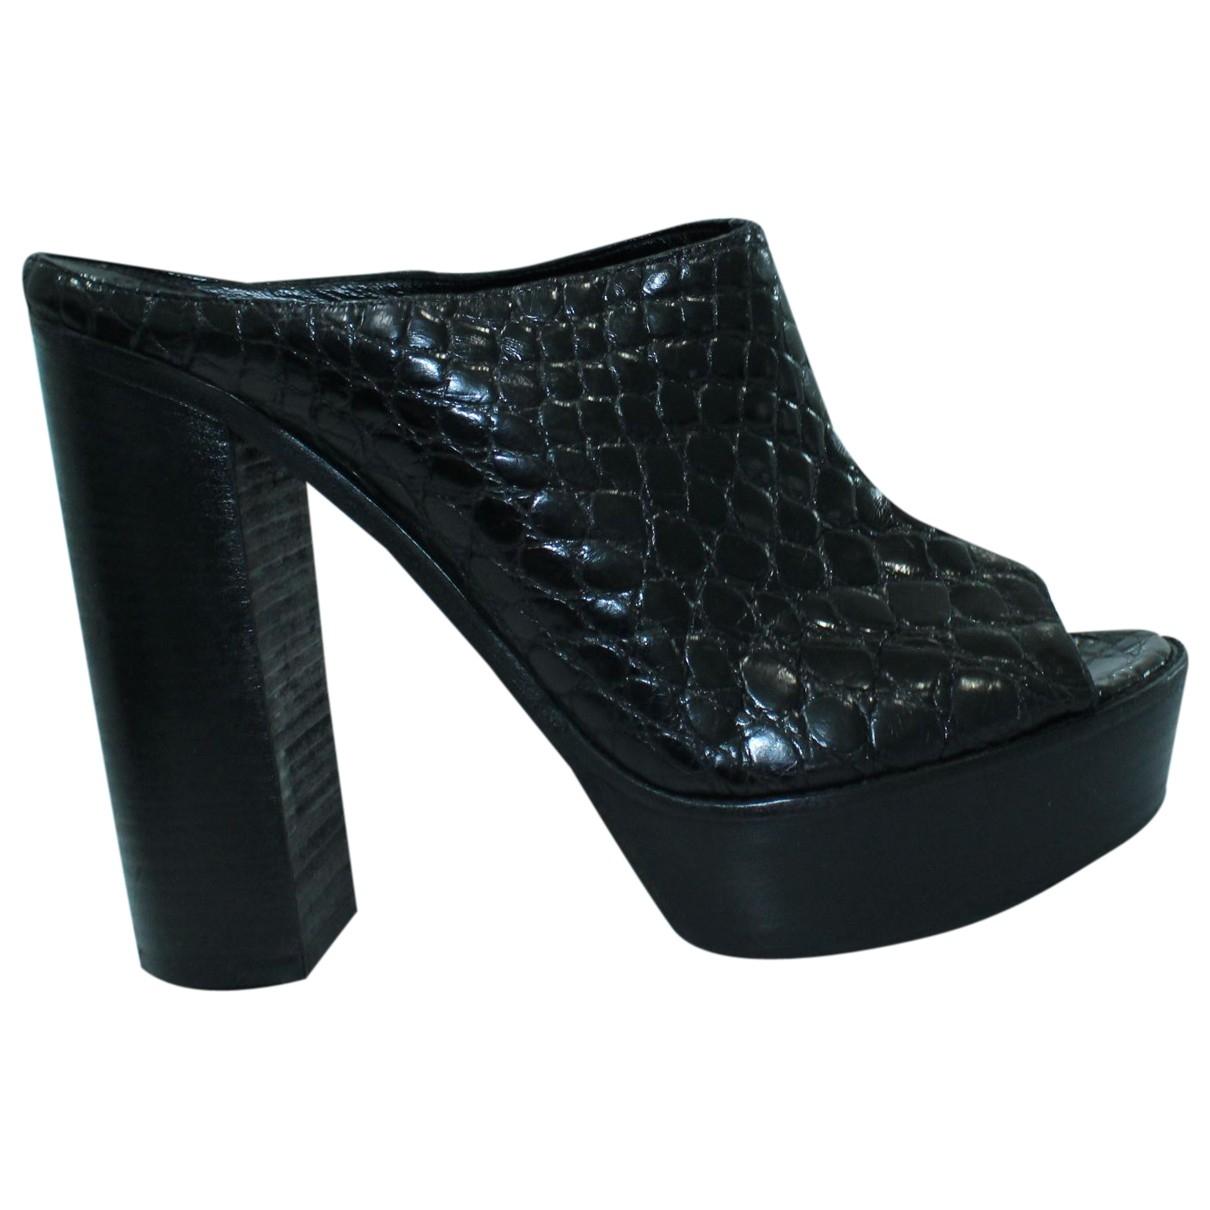 Chloé \N Black Leather Heels for Women 40 EU